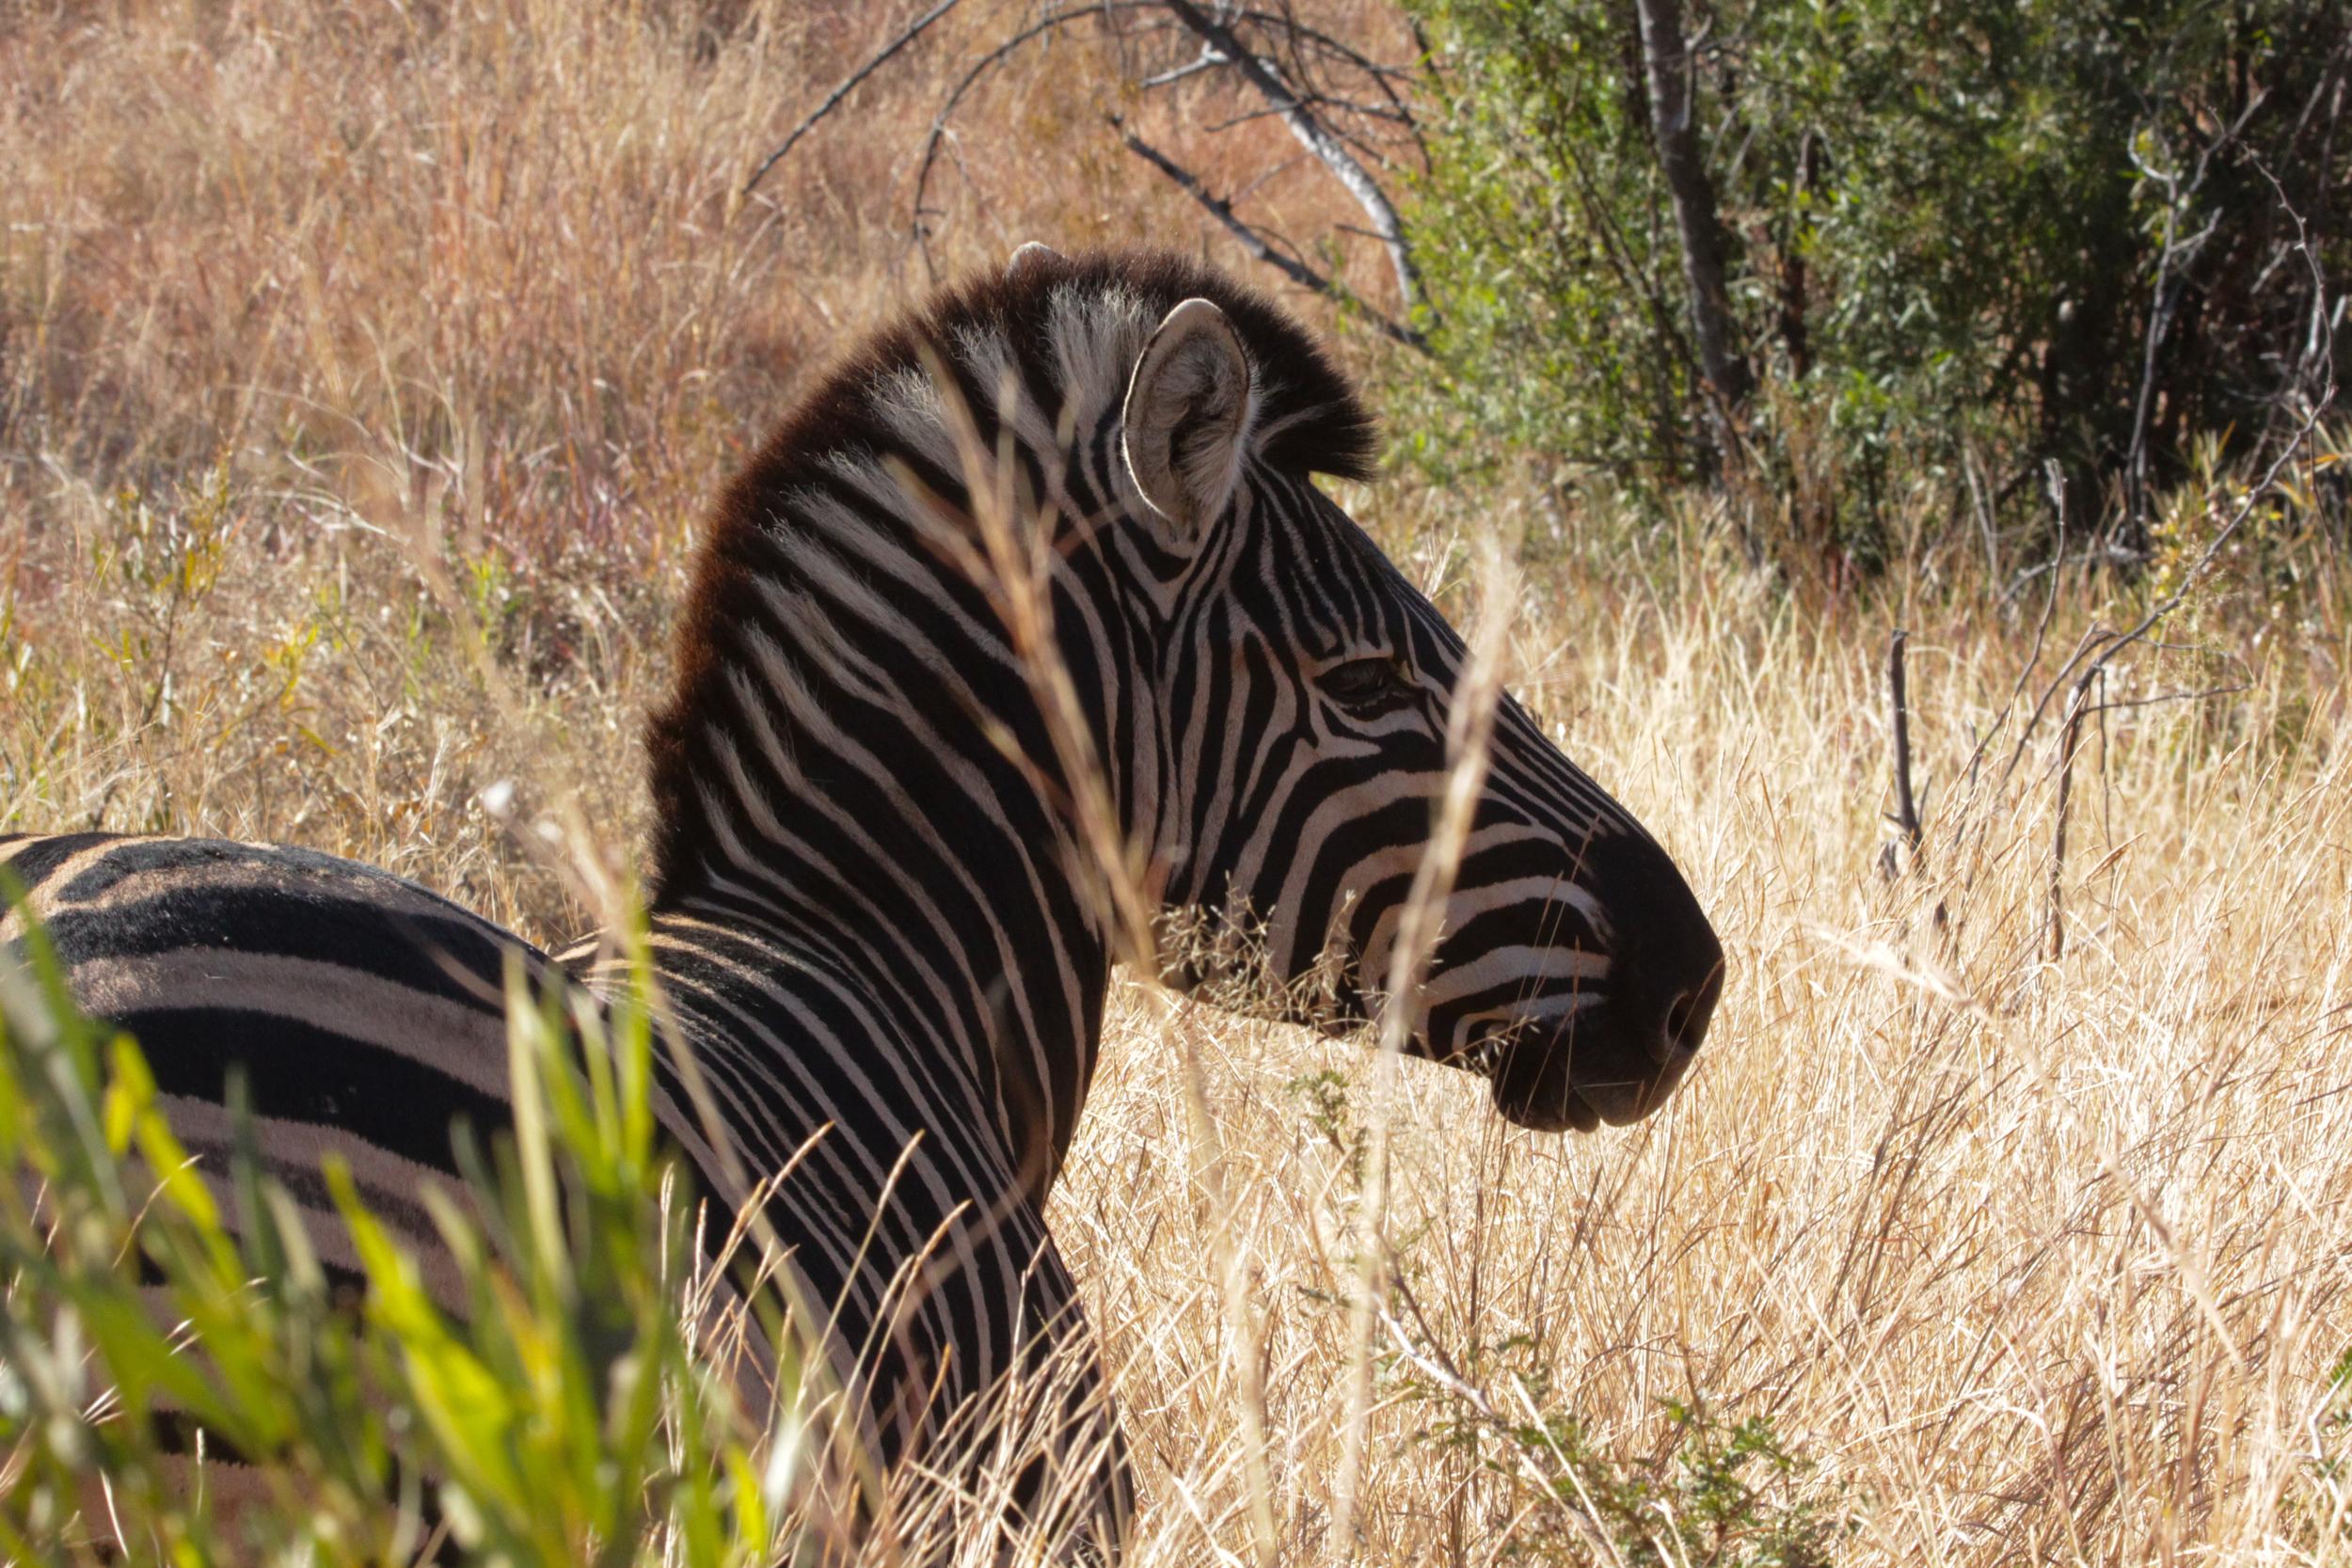 The zebras were everywhere!